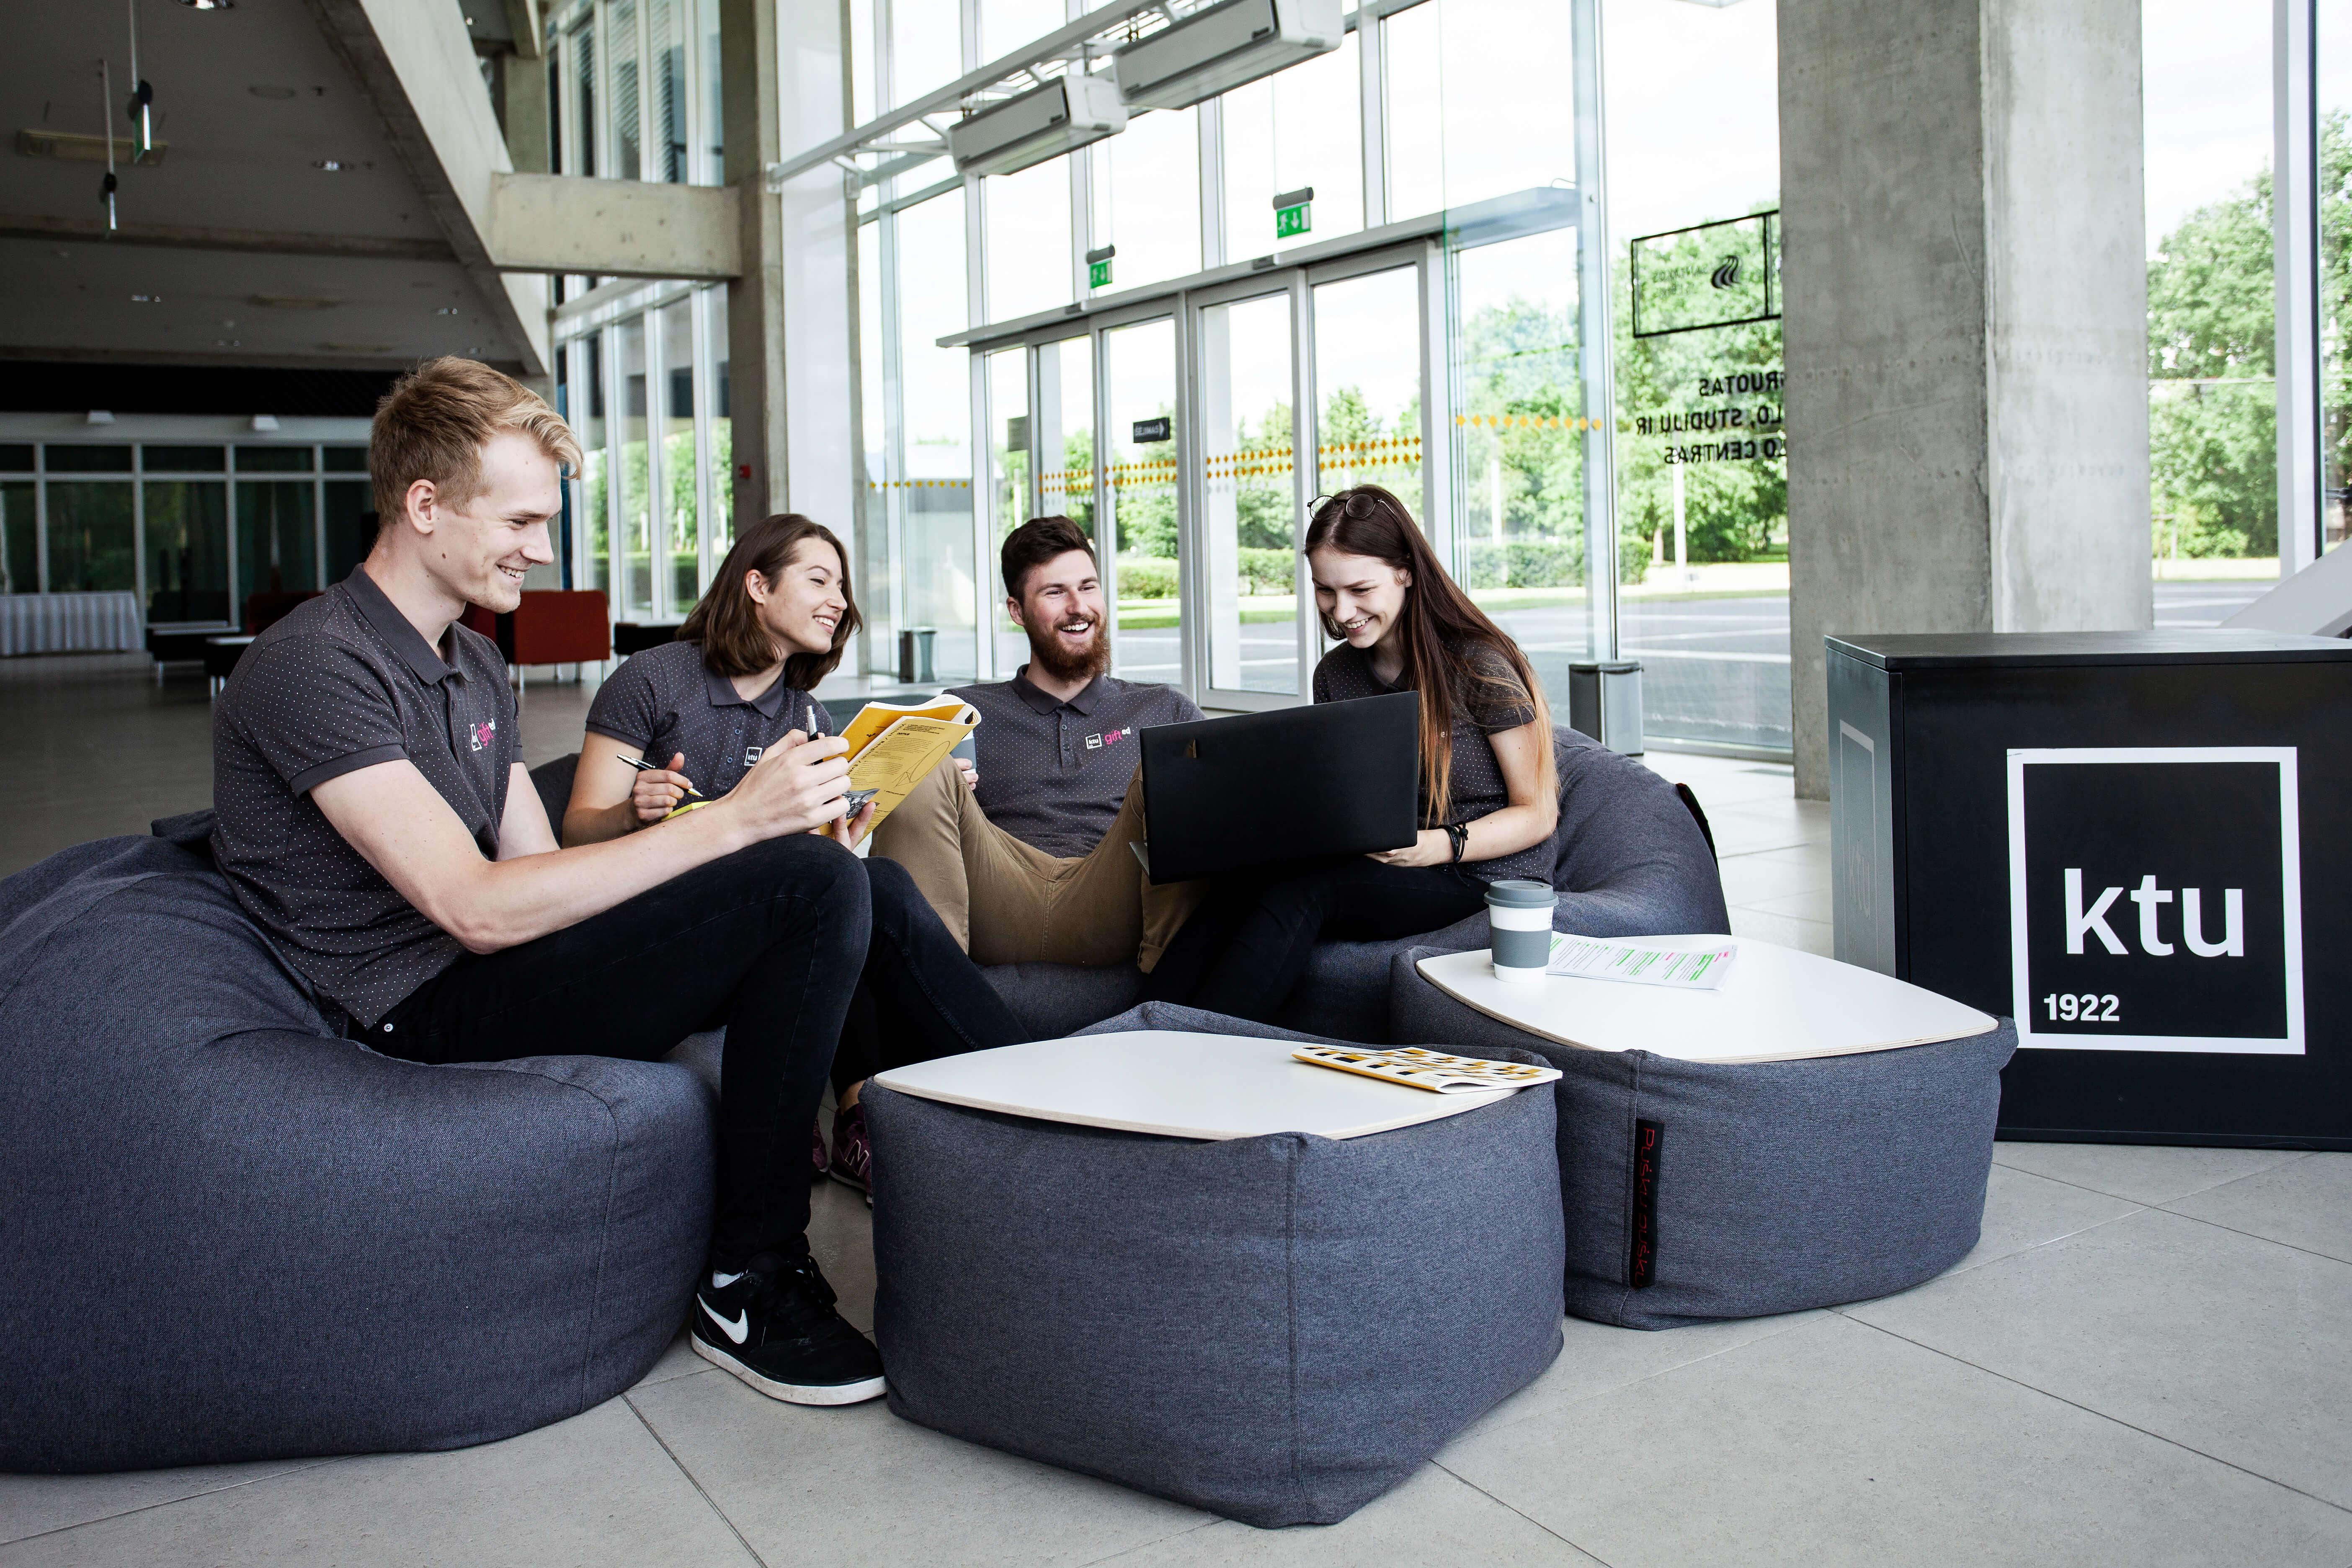 Kaunas University of Technology: A global university tackling global problems